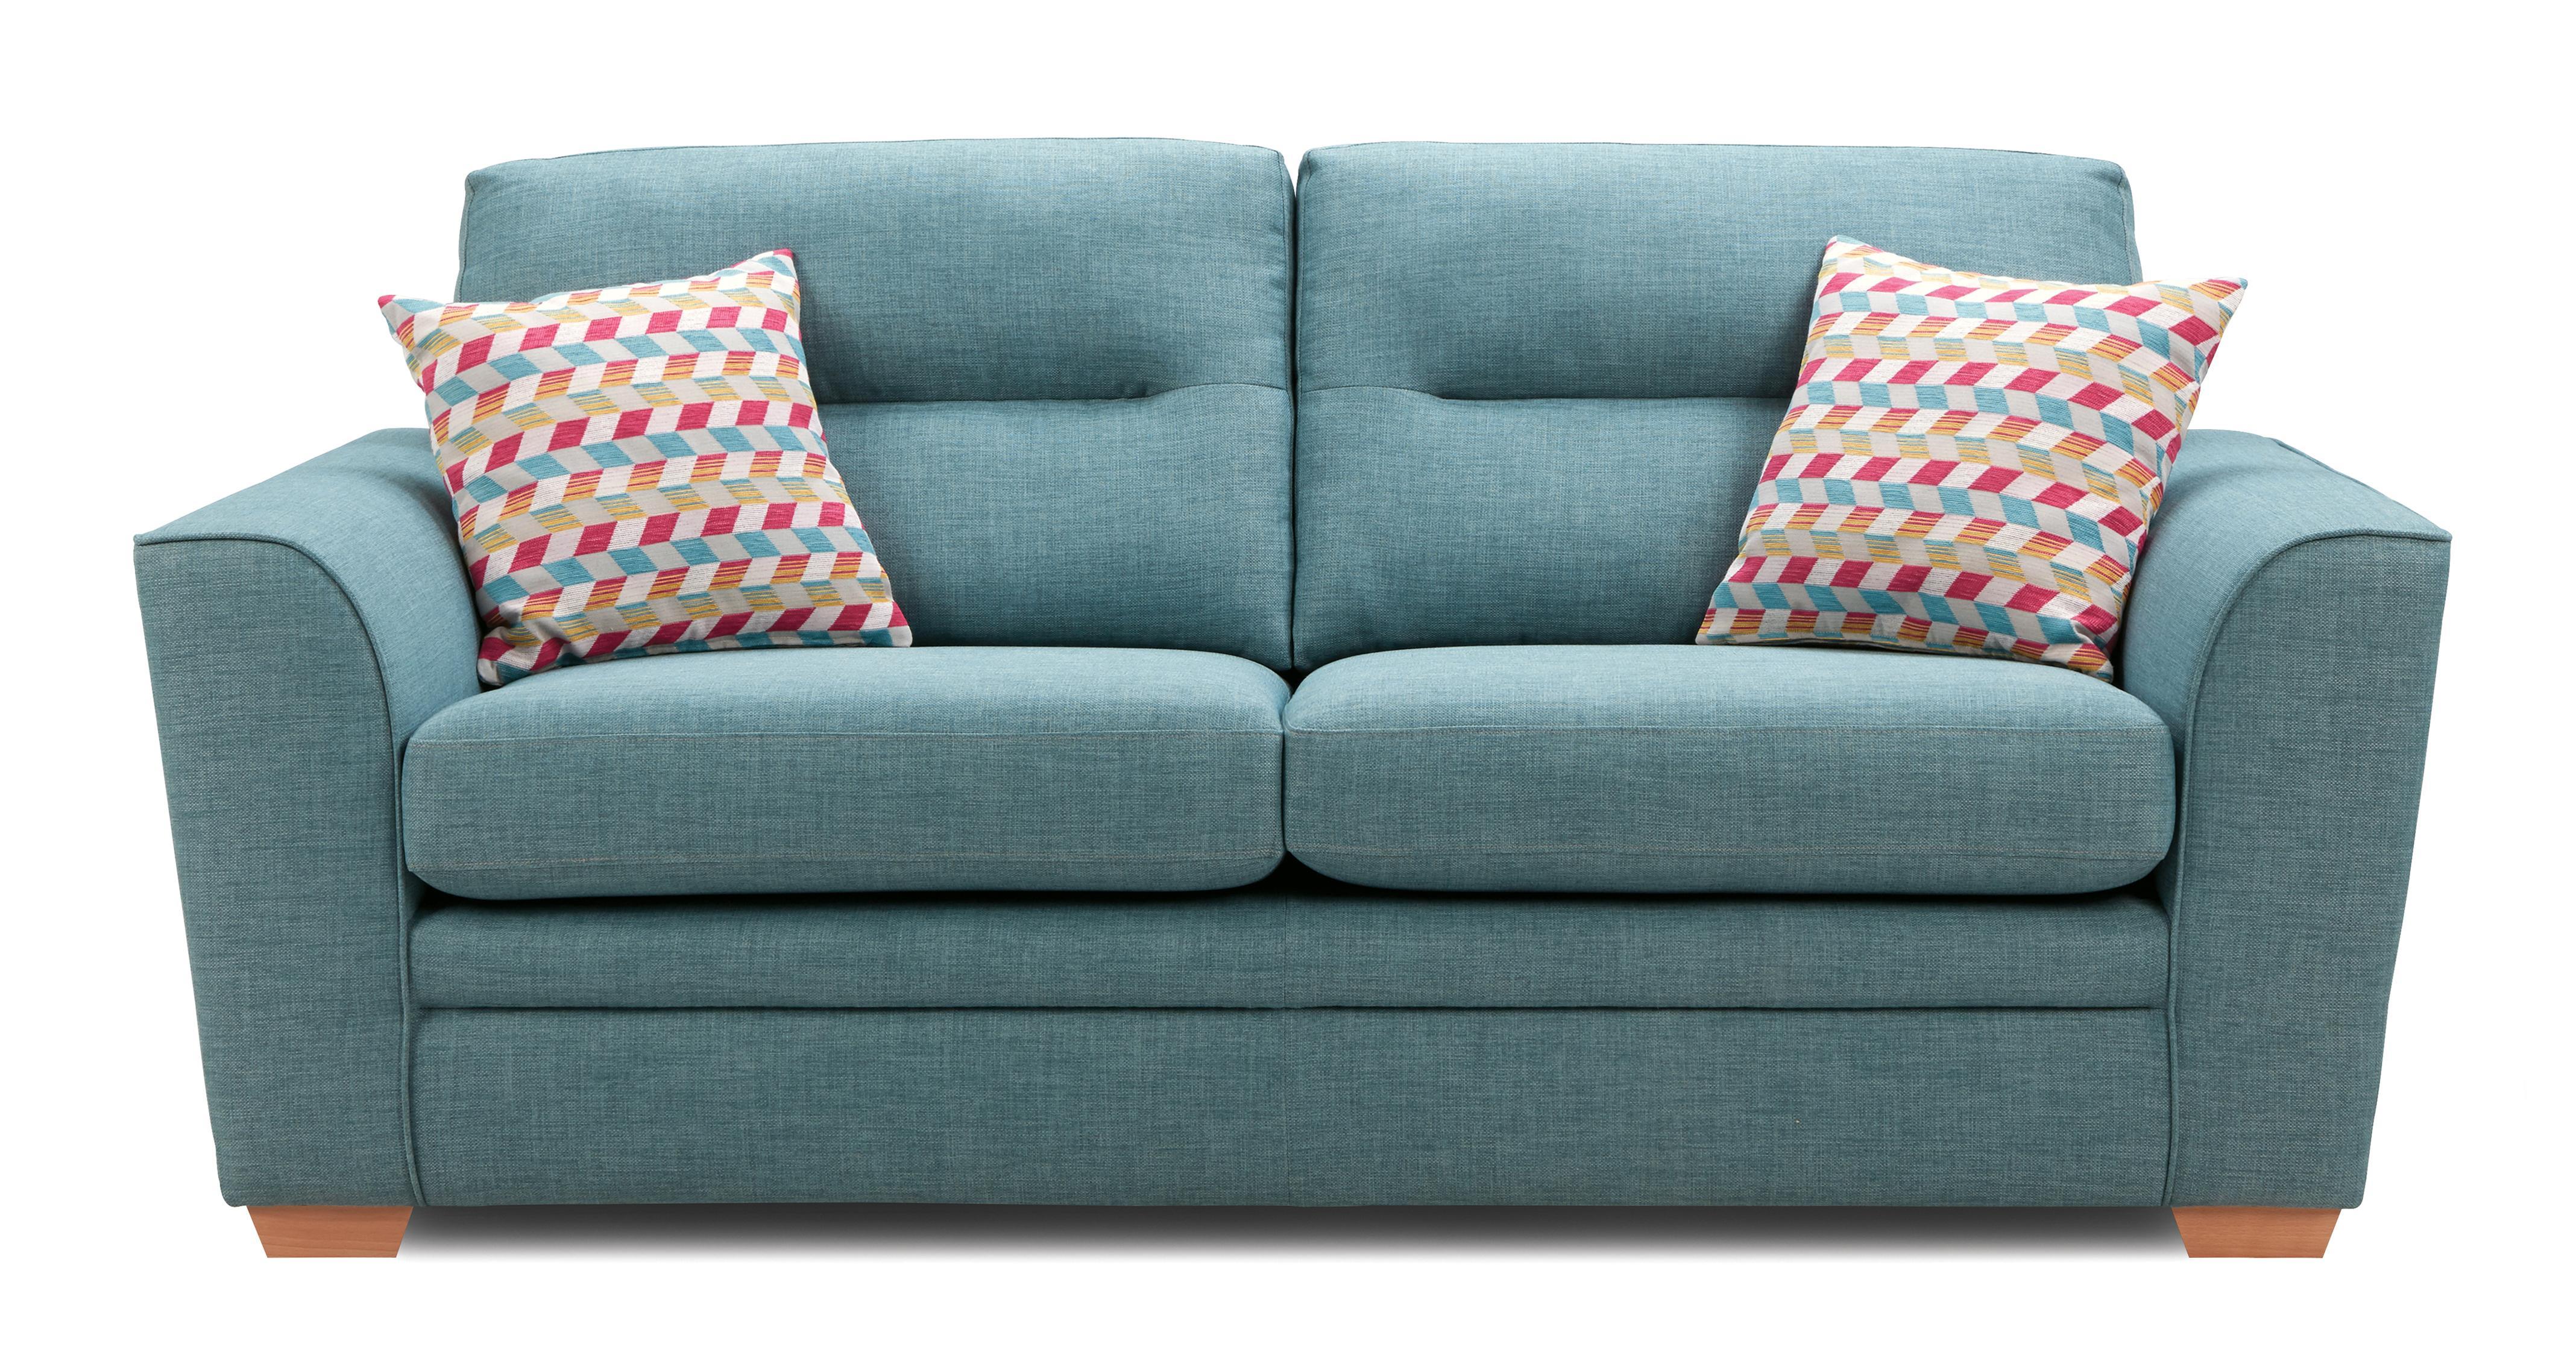 cheap teal sofas dark brown sofa rug soda 3 seater revive dfs